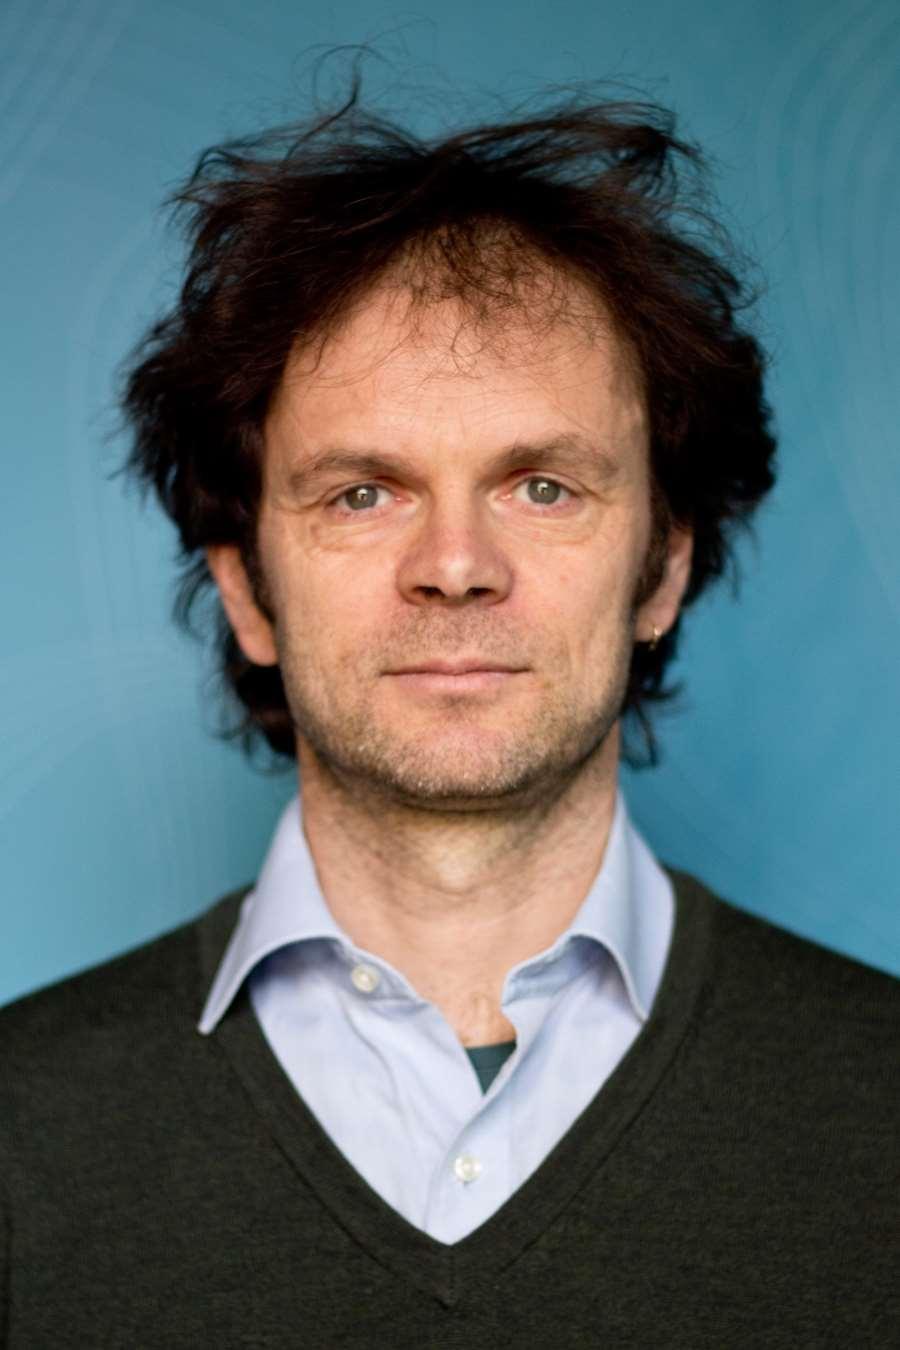 Nansen Memorial Lecture by Håvard Hegre